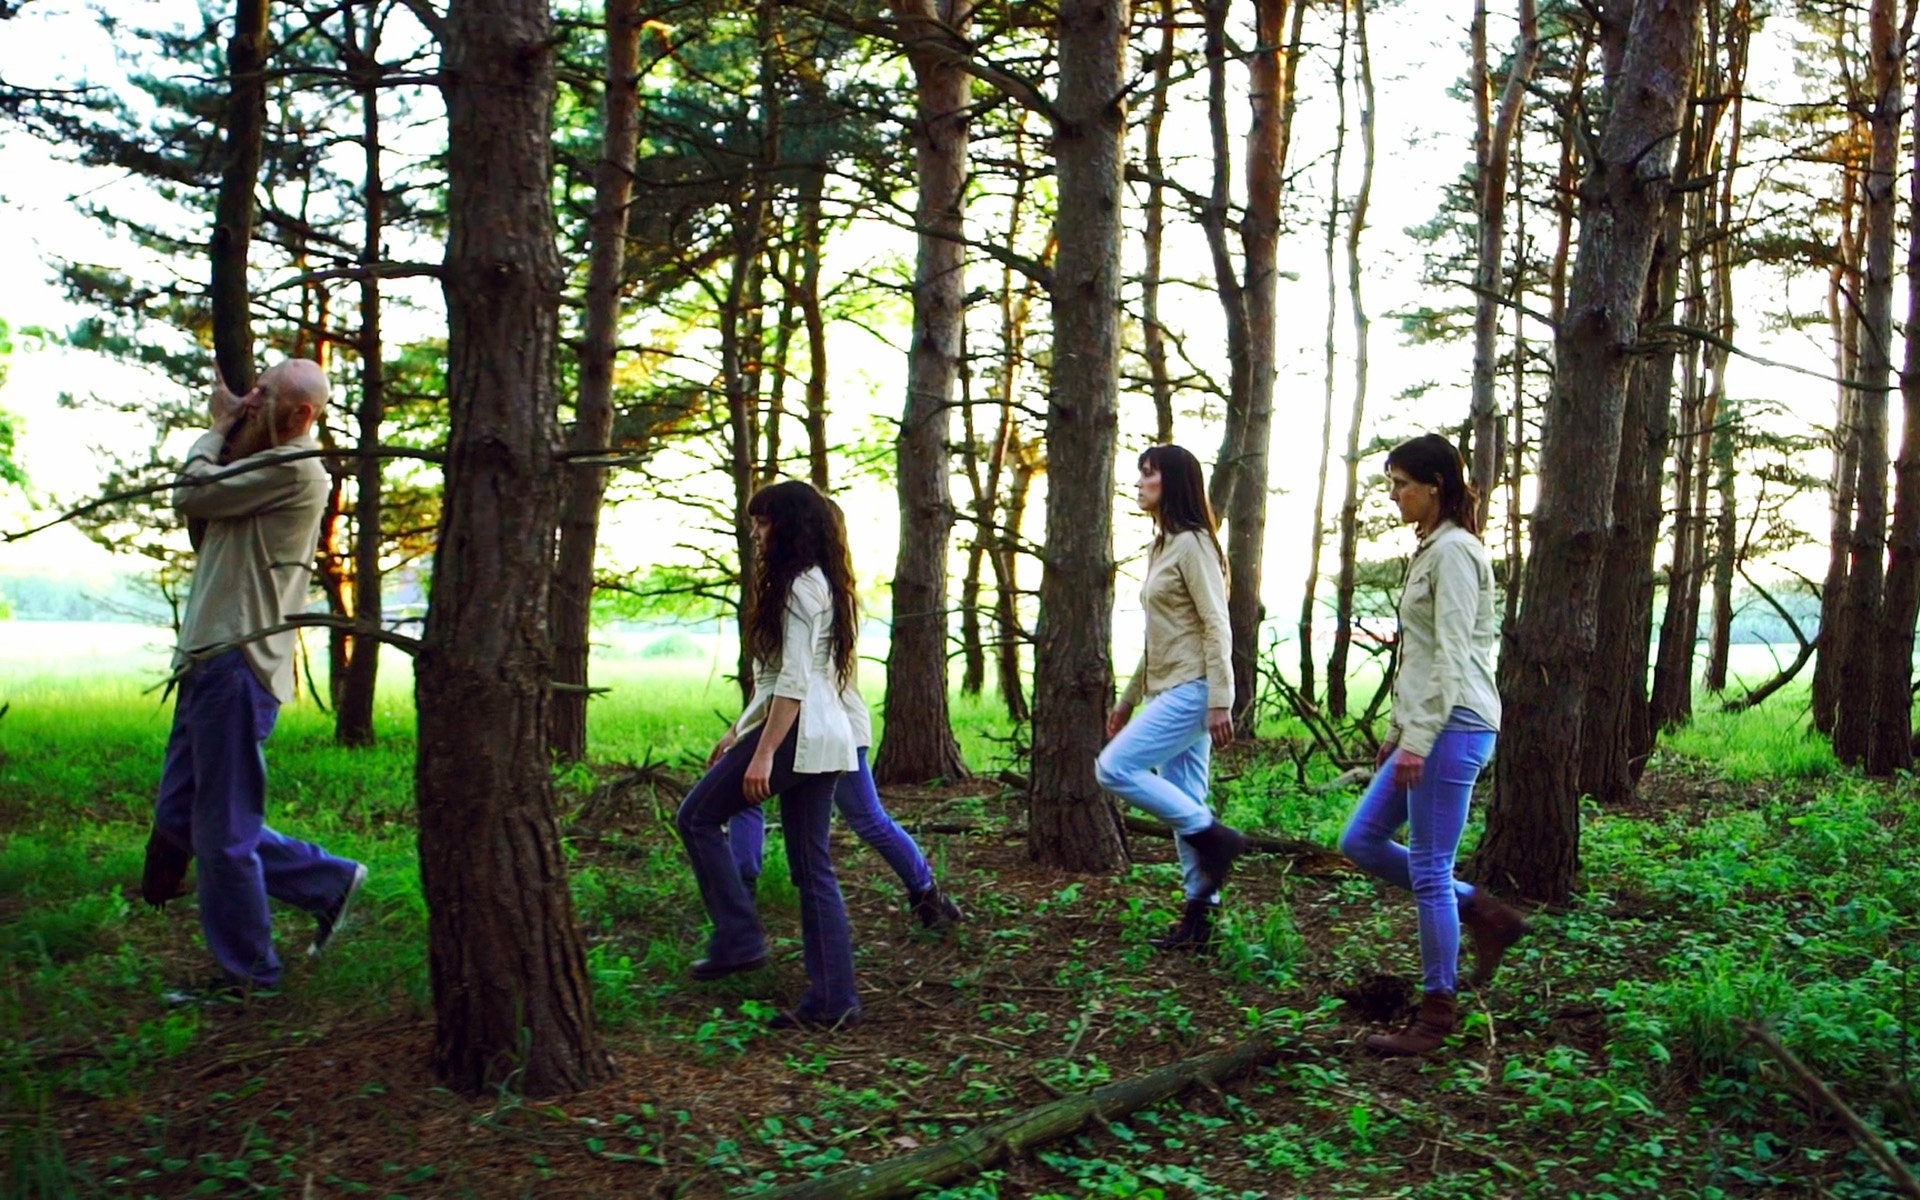 h_PullMeBack_walk-woods